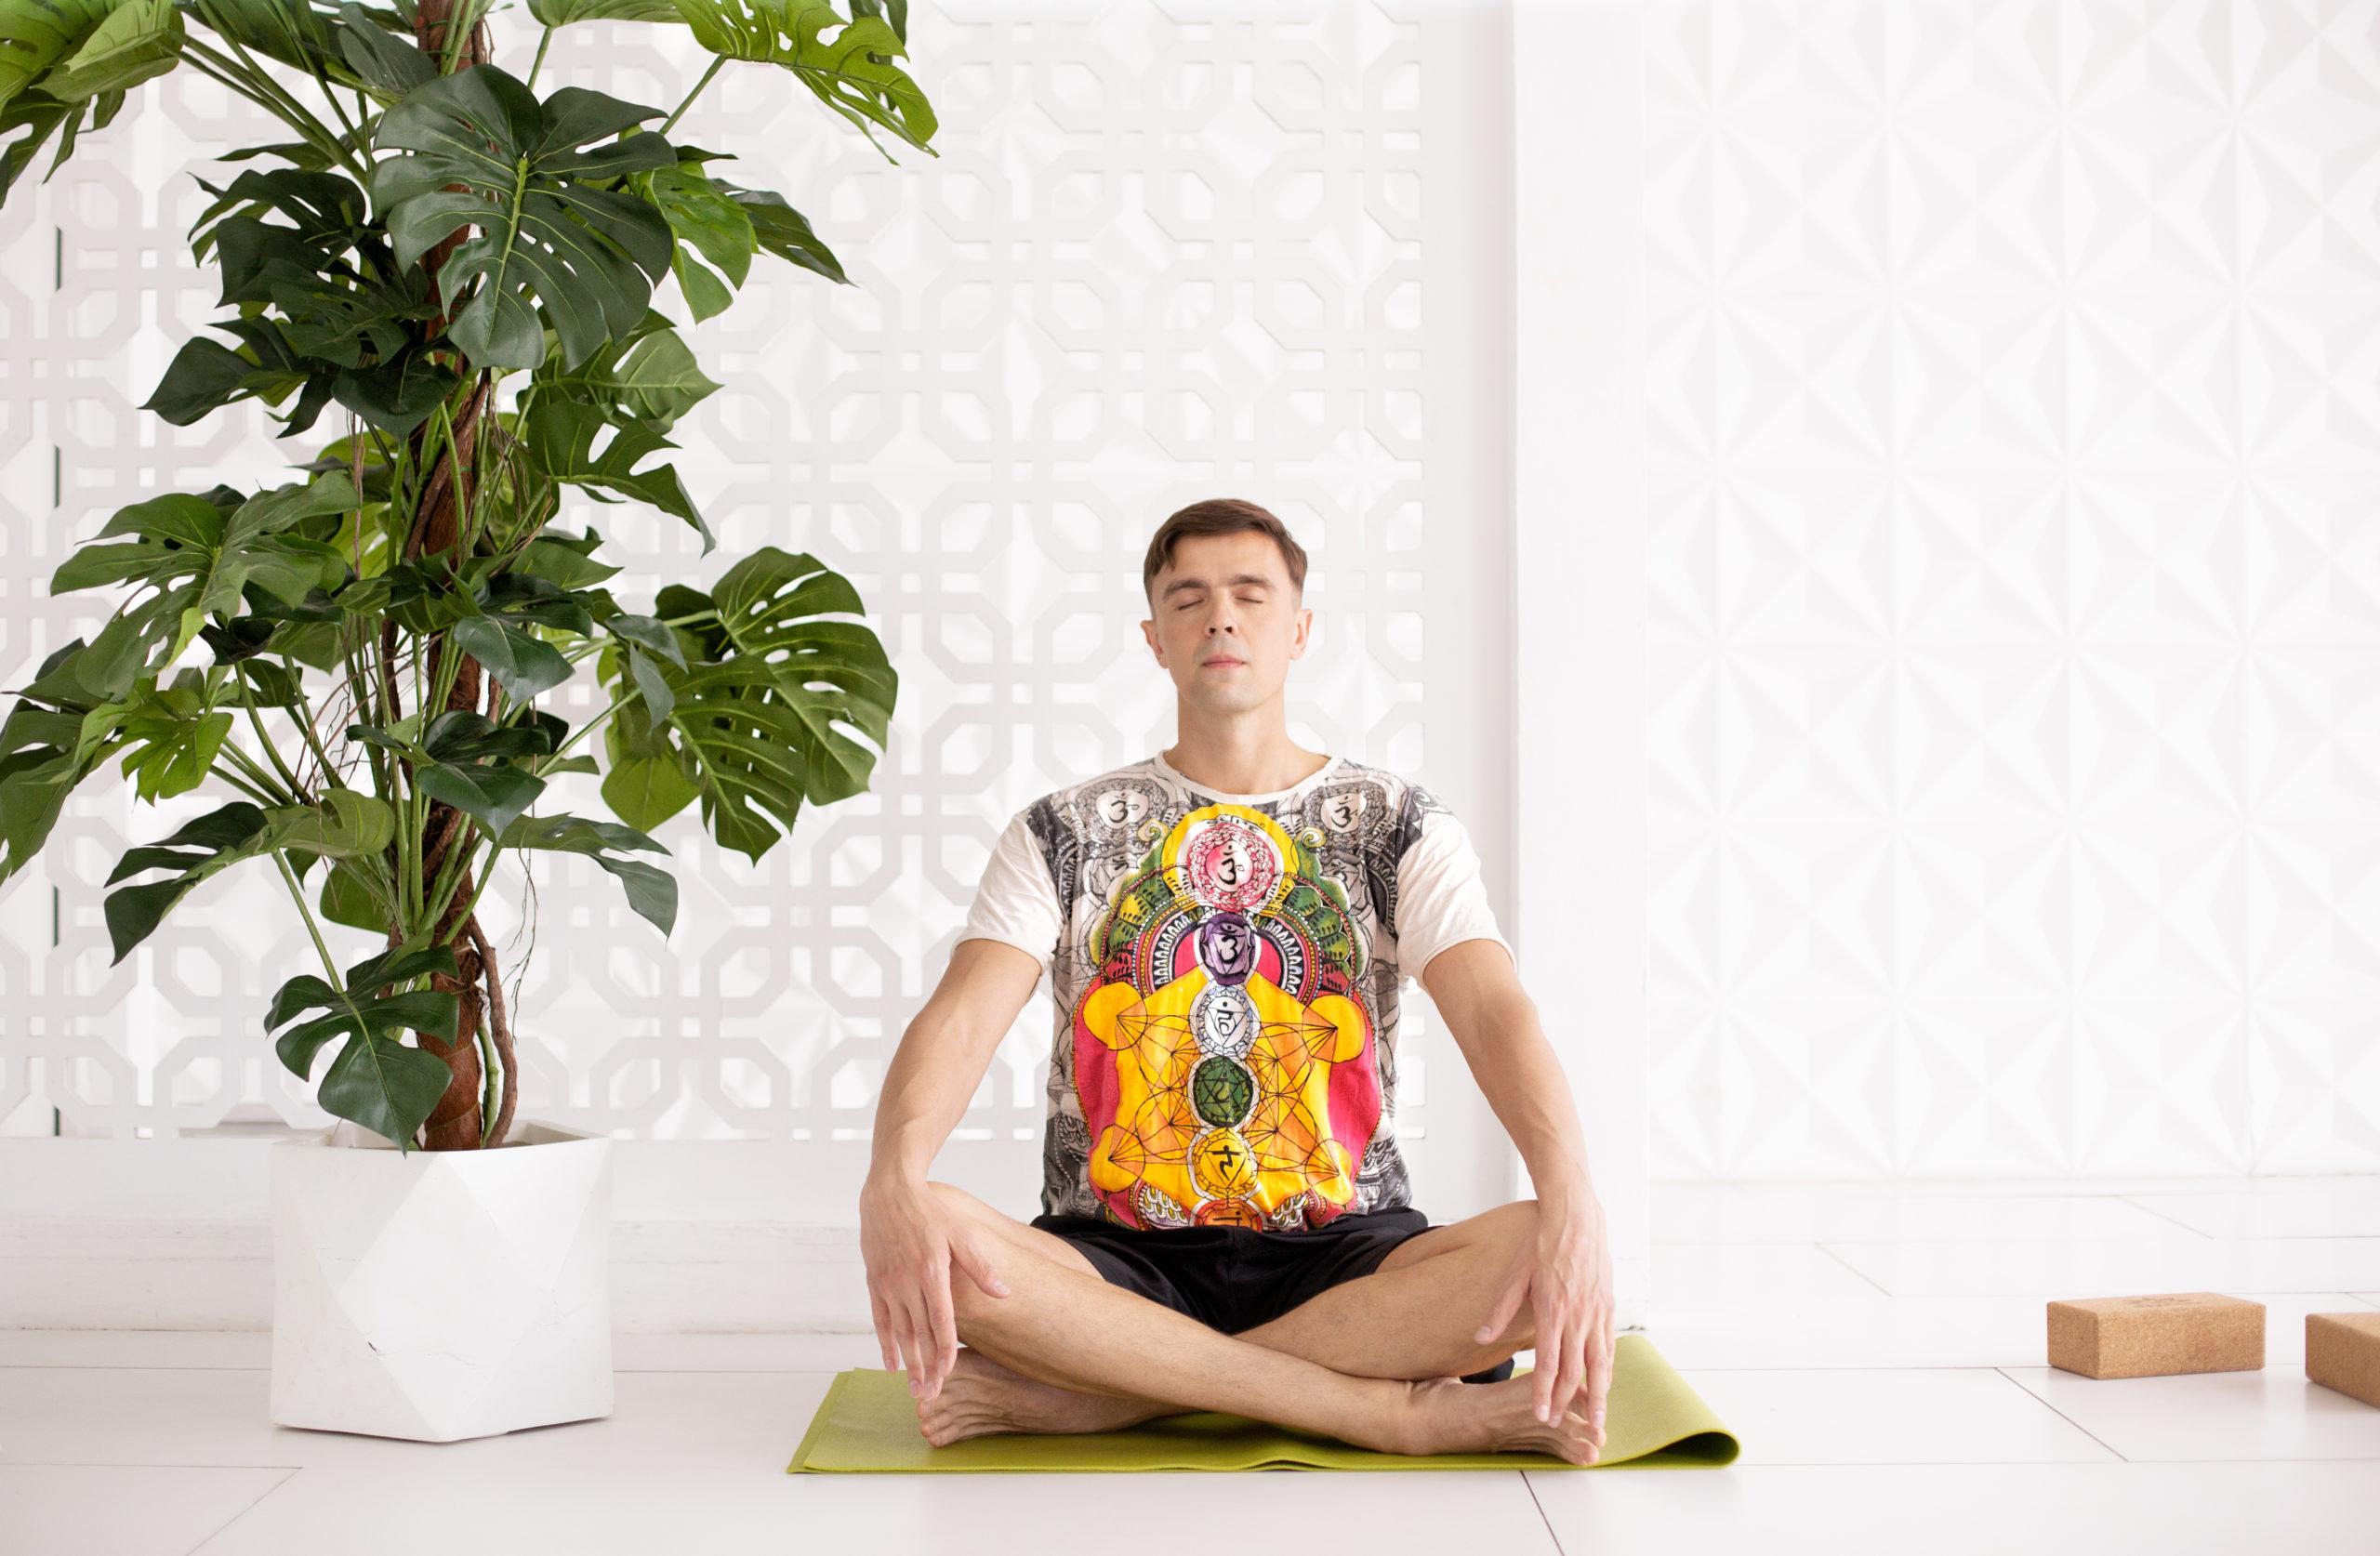 йог медитирует фото